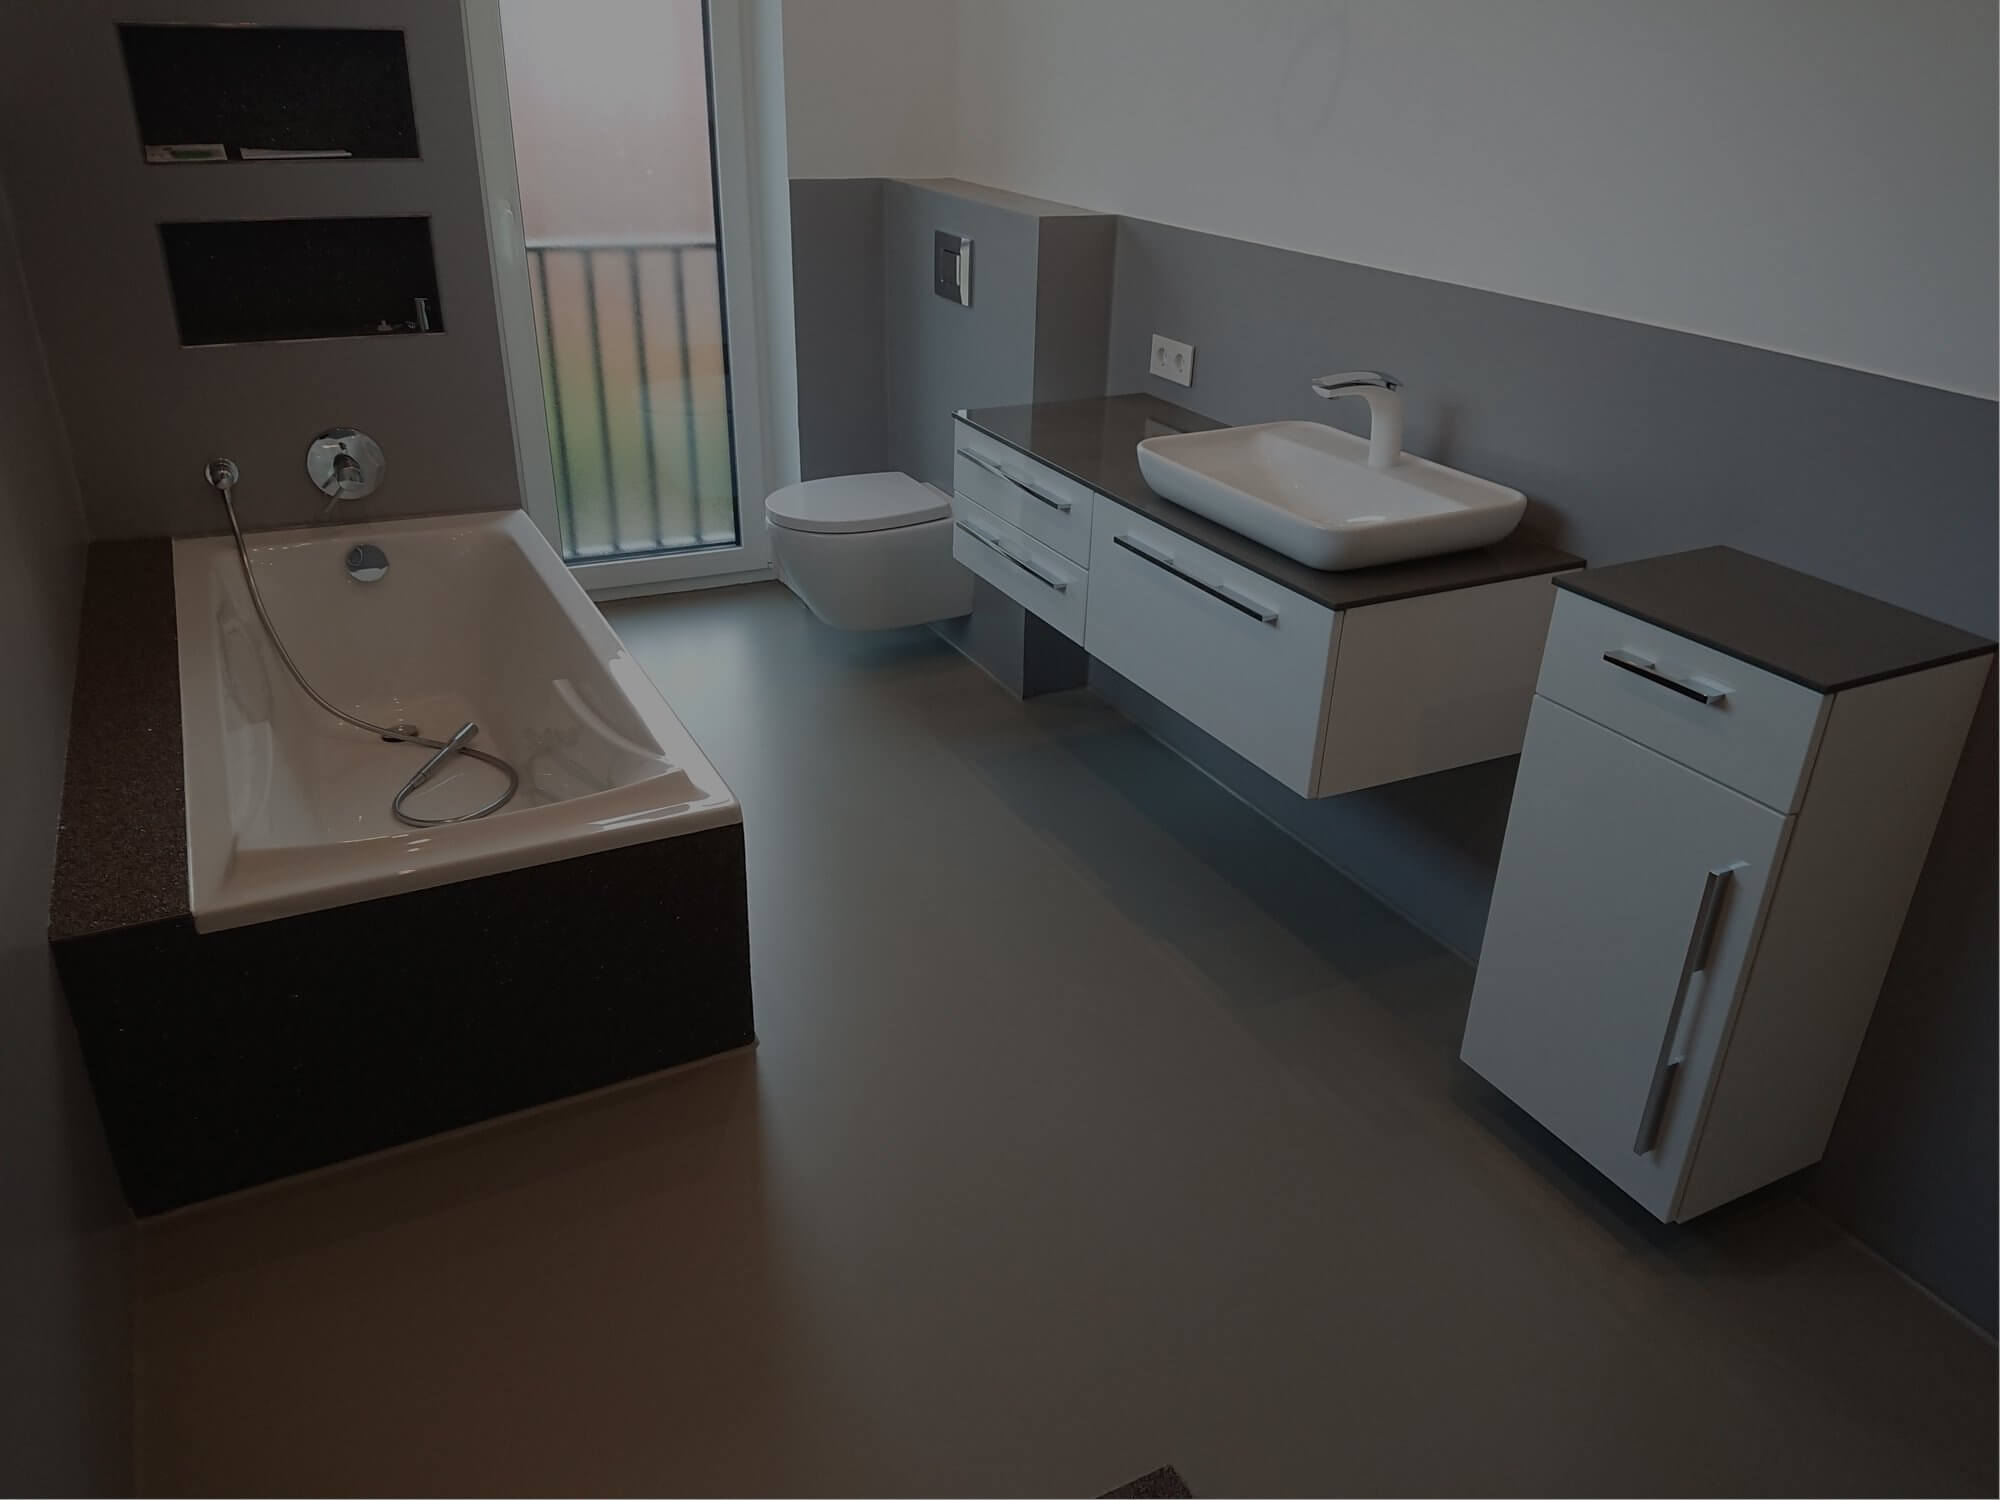 Flüssiger Bodenbelag Badezimmer